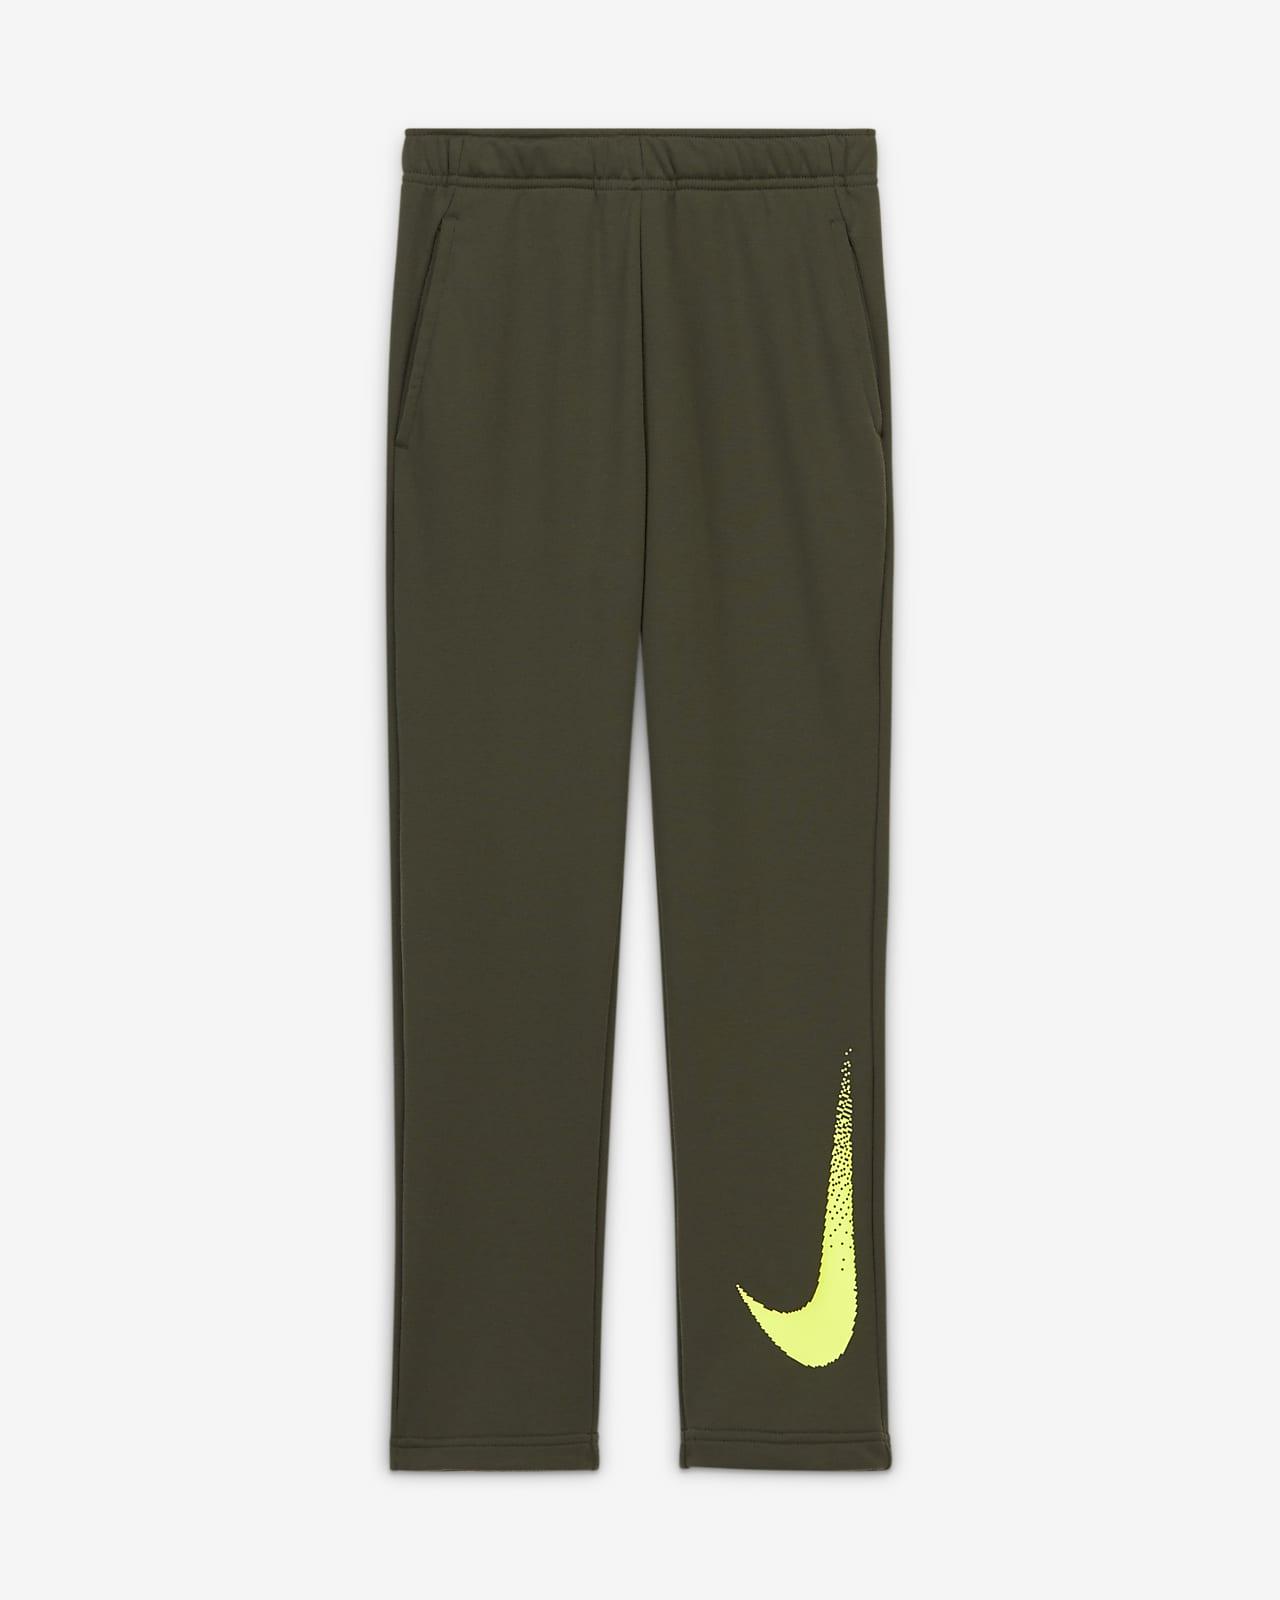 Nike Dri-FIT Older Kids' (Boys') Graphic Fleece Trousers